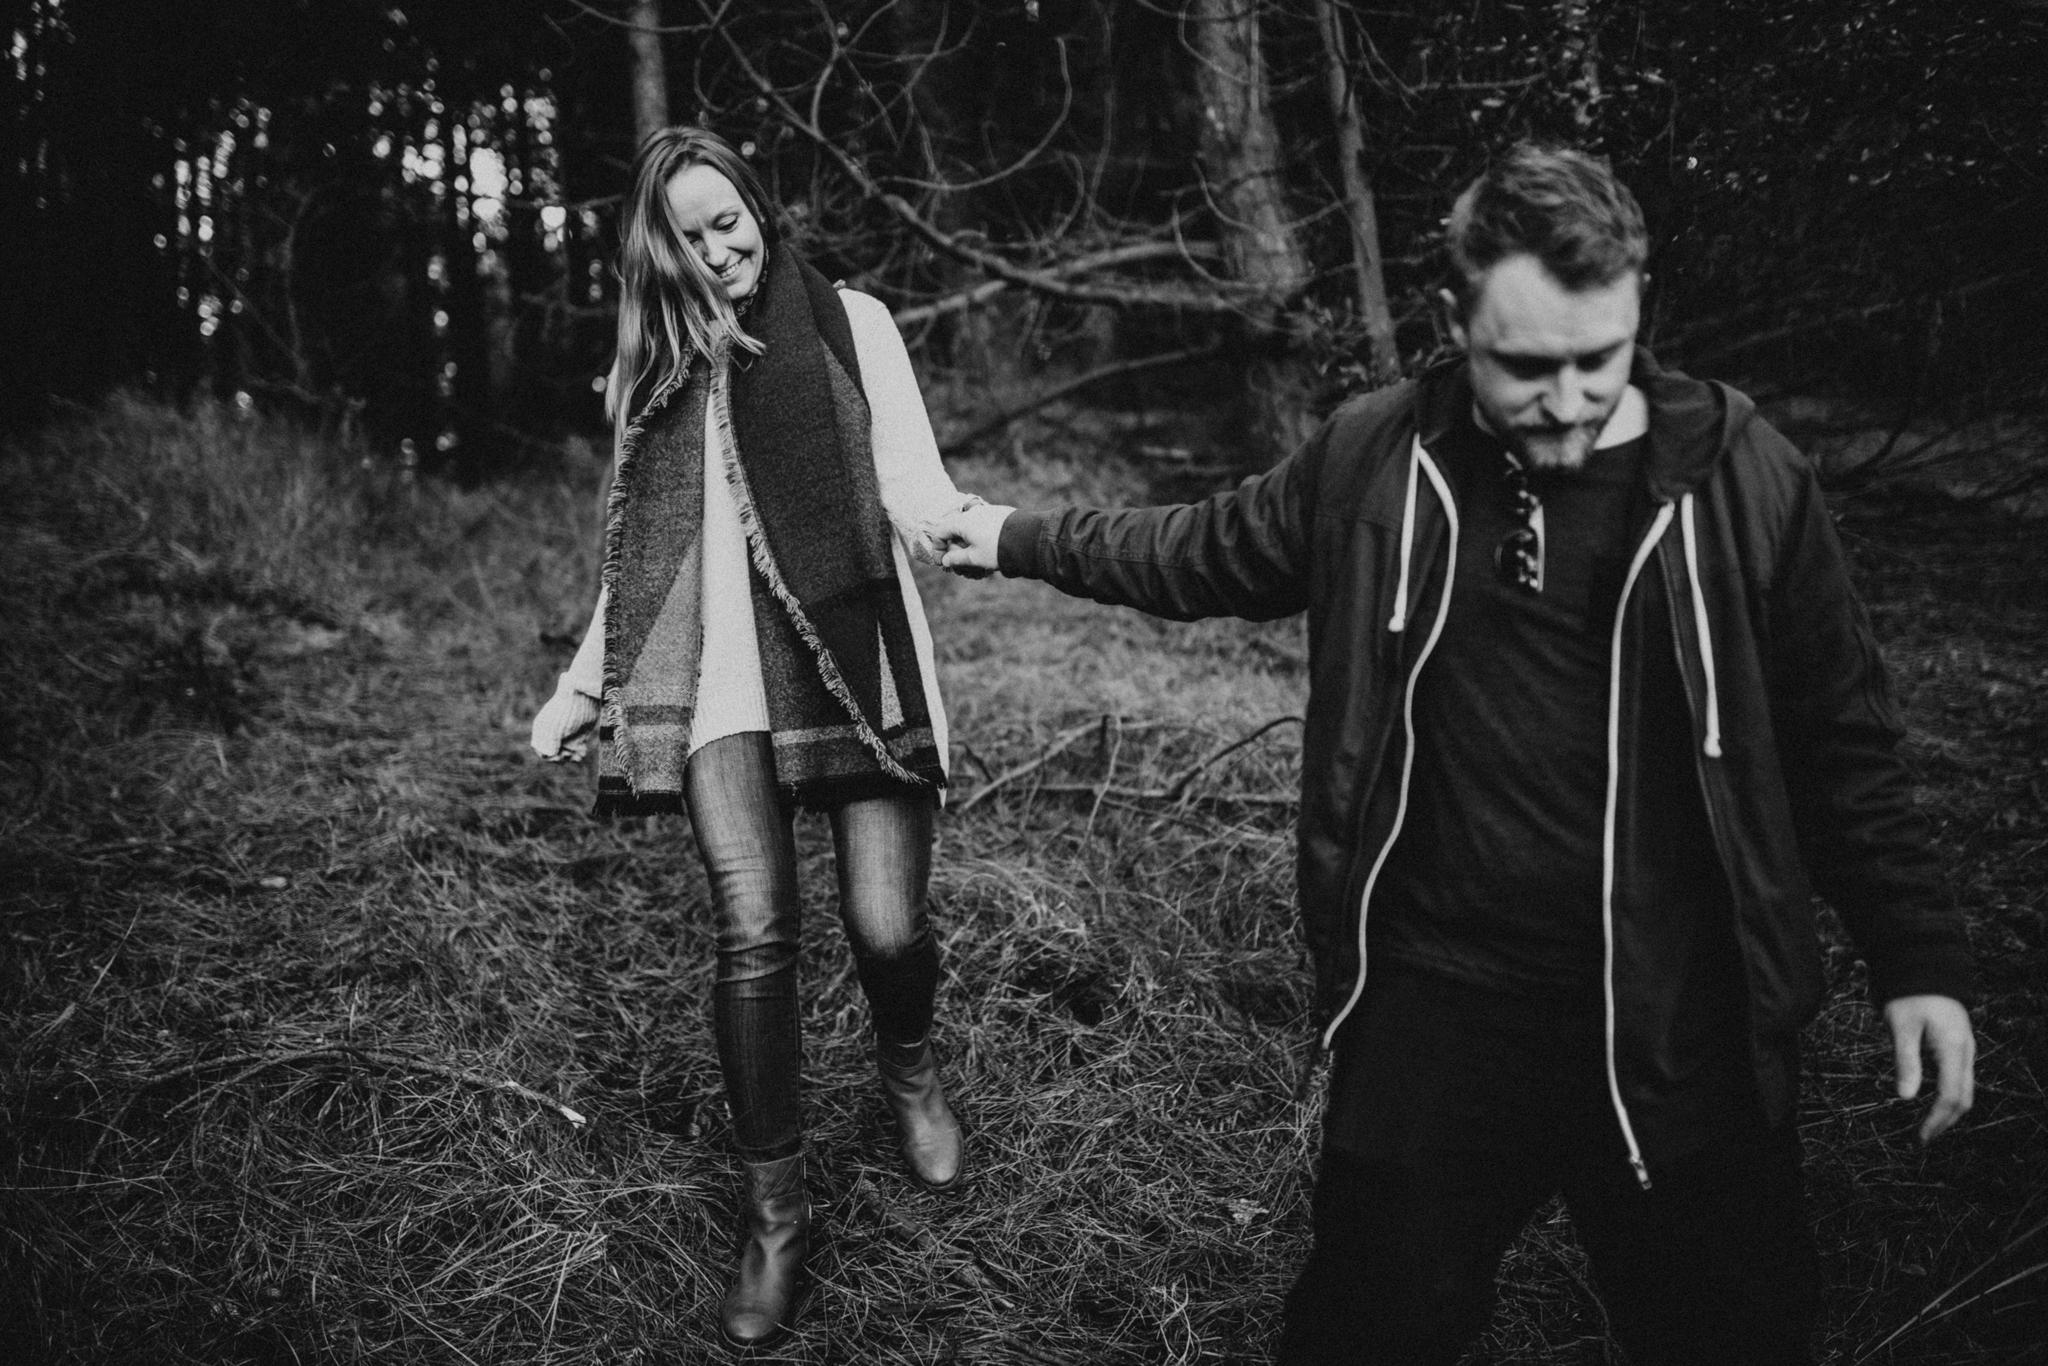 Luke-Mary-Engagement-Adventure-Session-Norfolk-Photography-Photographer-Darina-Stoda-25.jpg